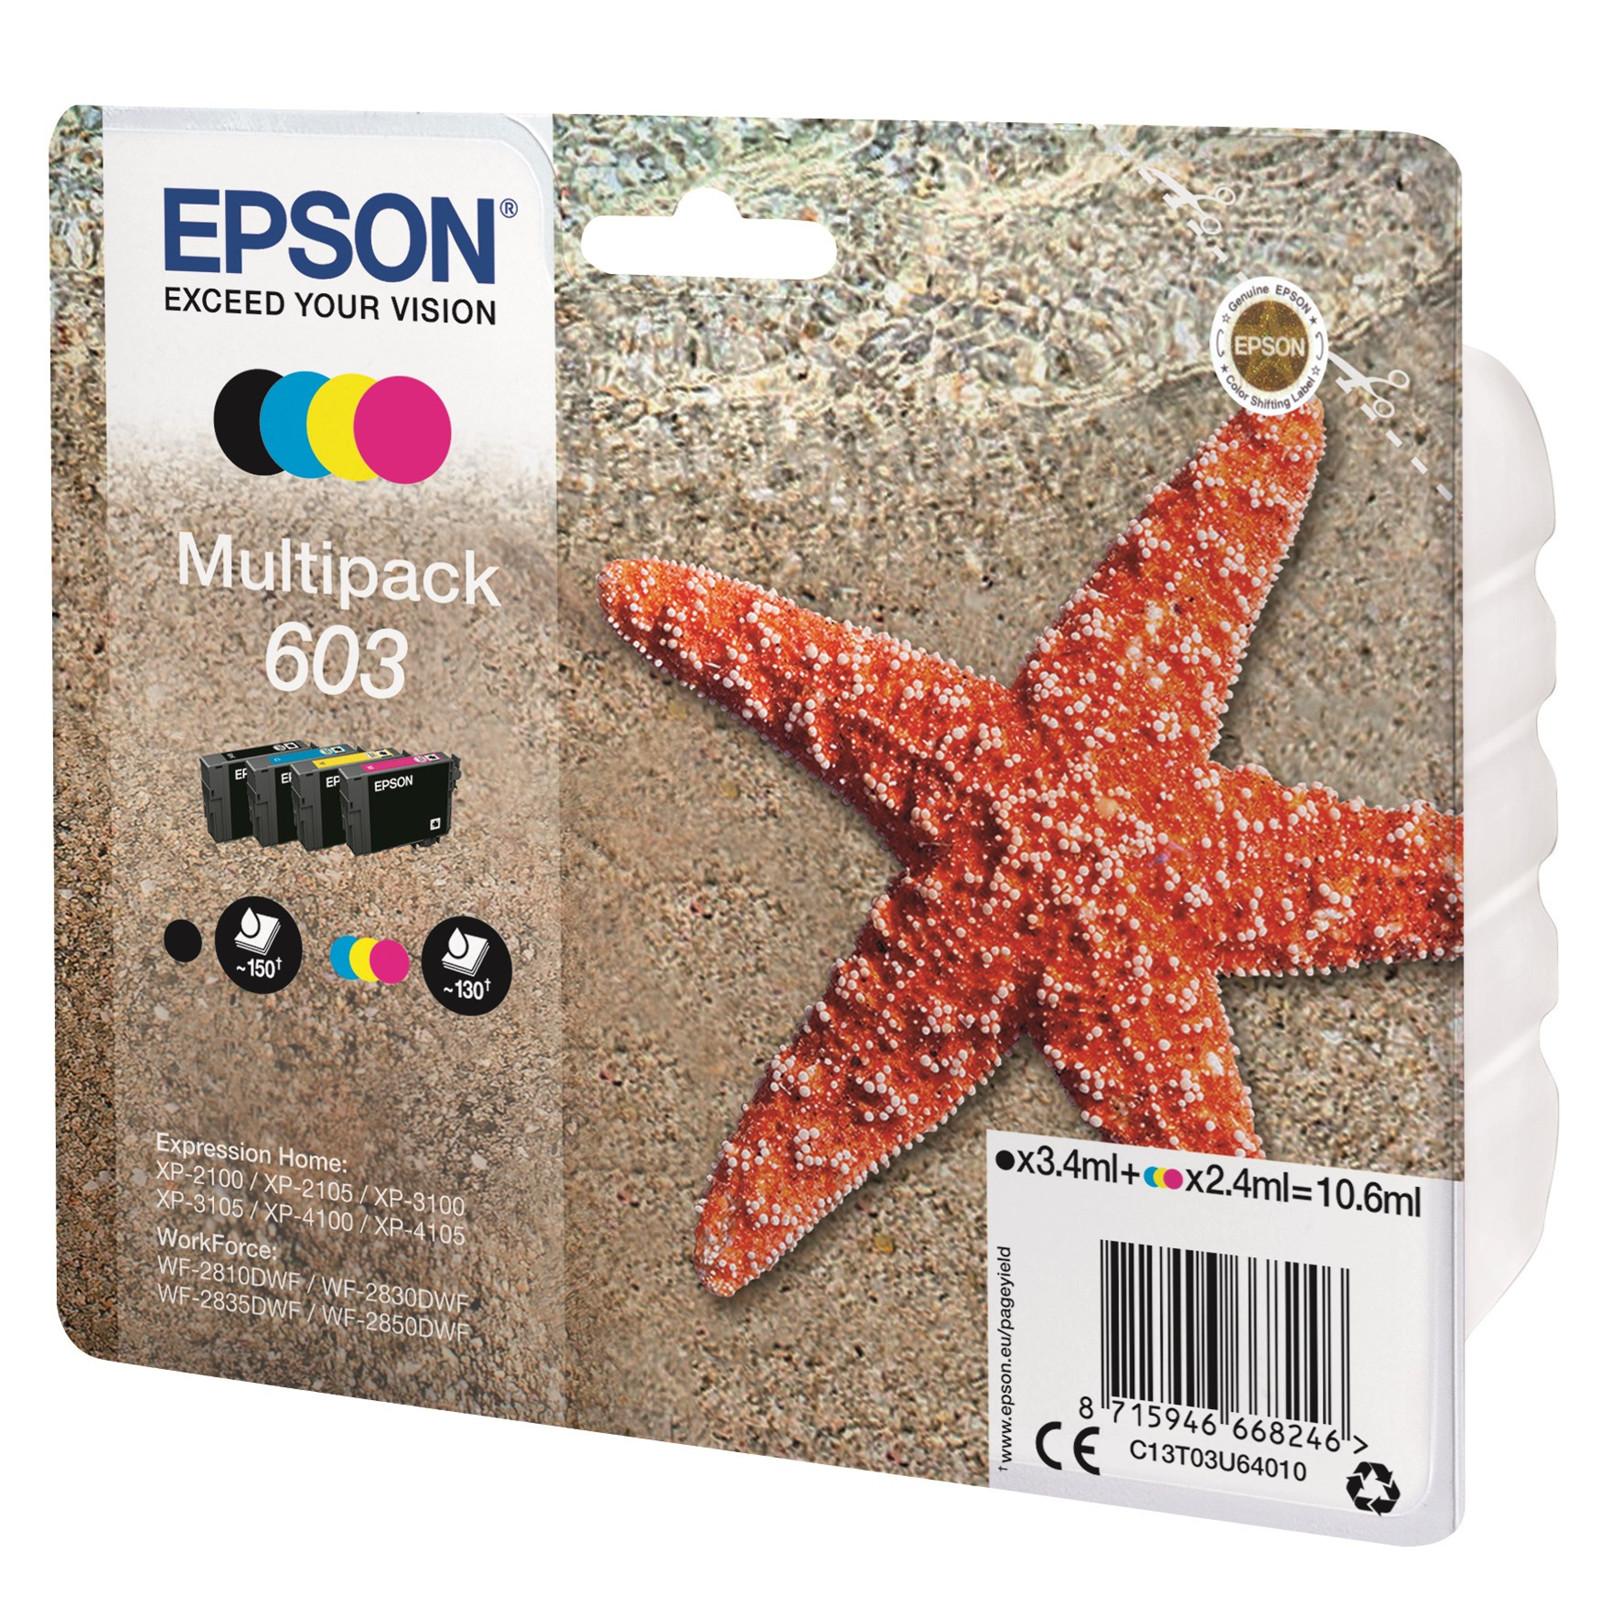 Epson T03U Multipack 4-colours 603 Ink Cartridge w/alarm